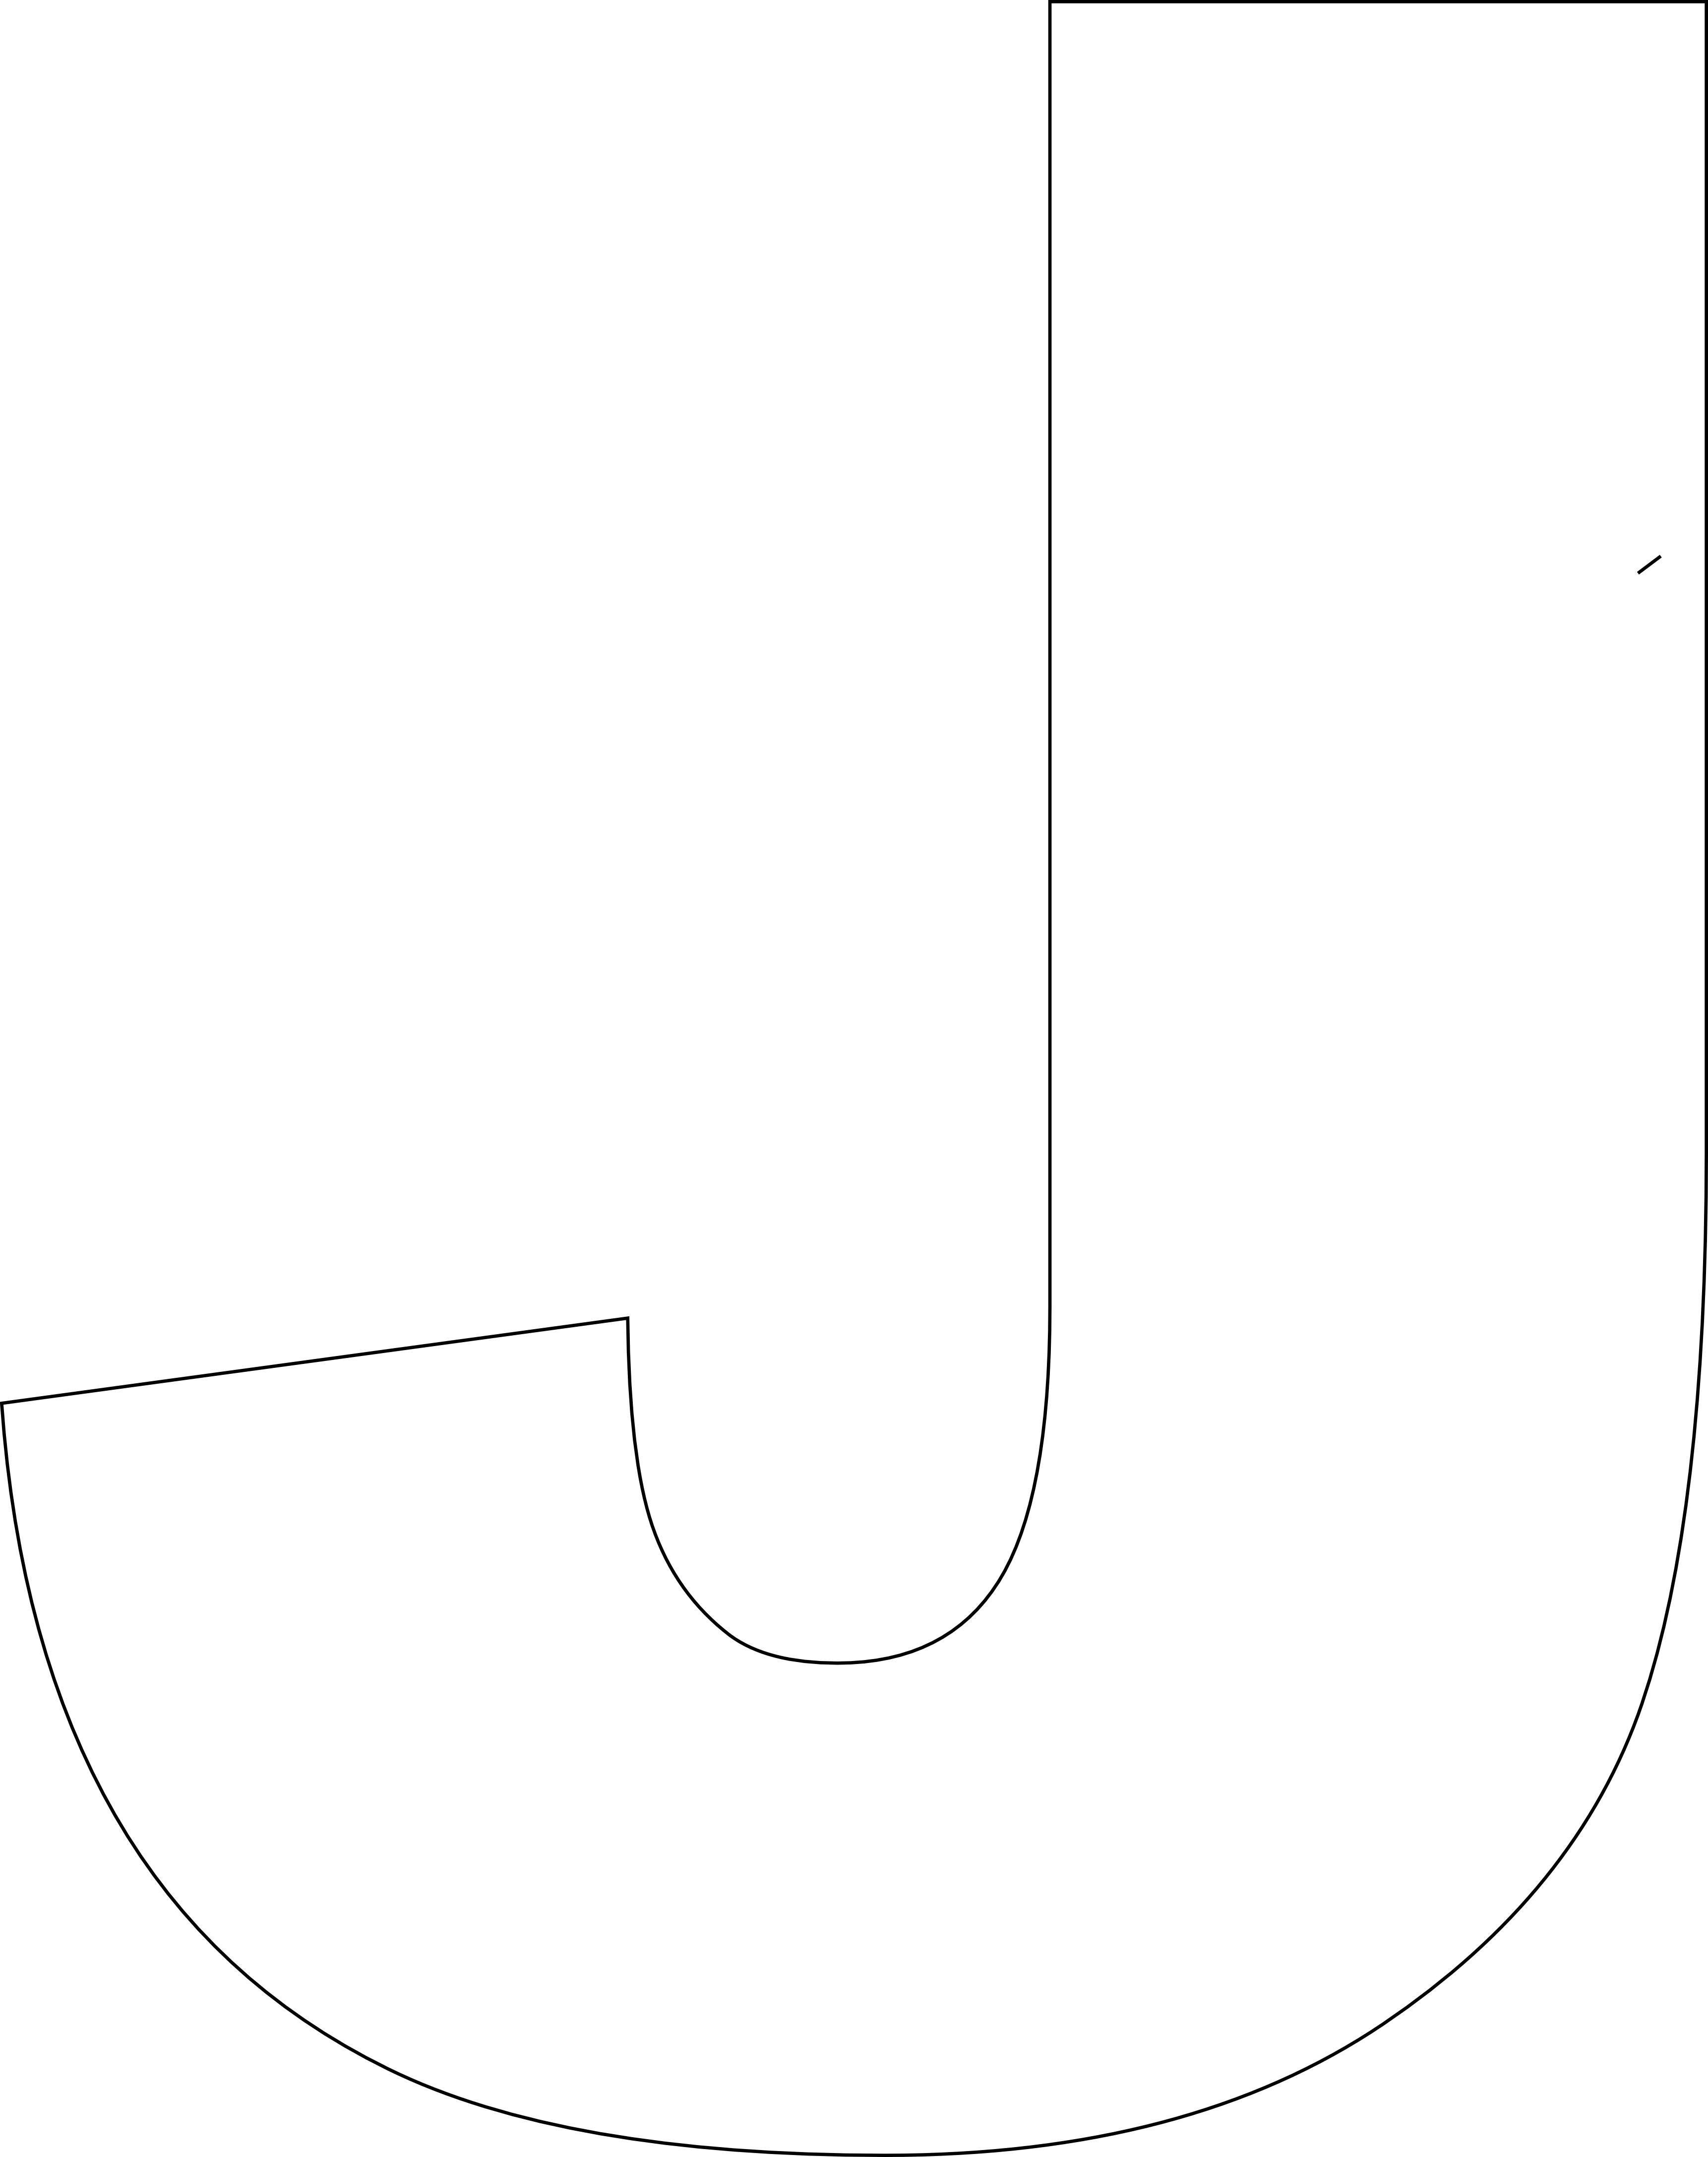 Free Printable Upper Case Alphabet Template | Stencil | Alphabet - Free Printable Letter J